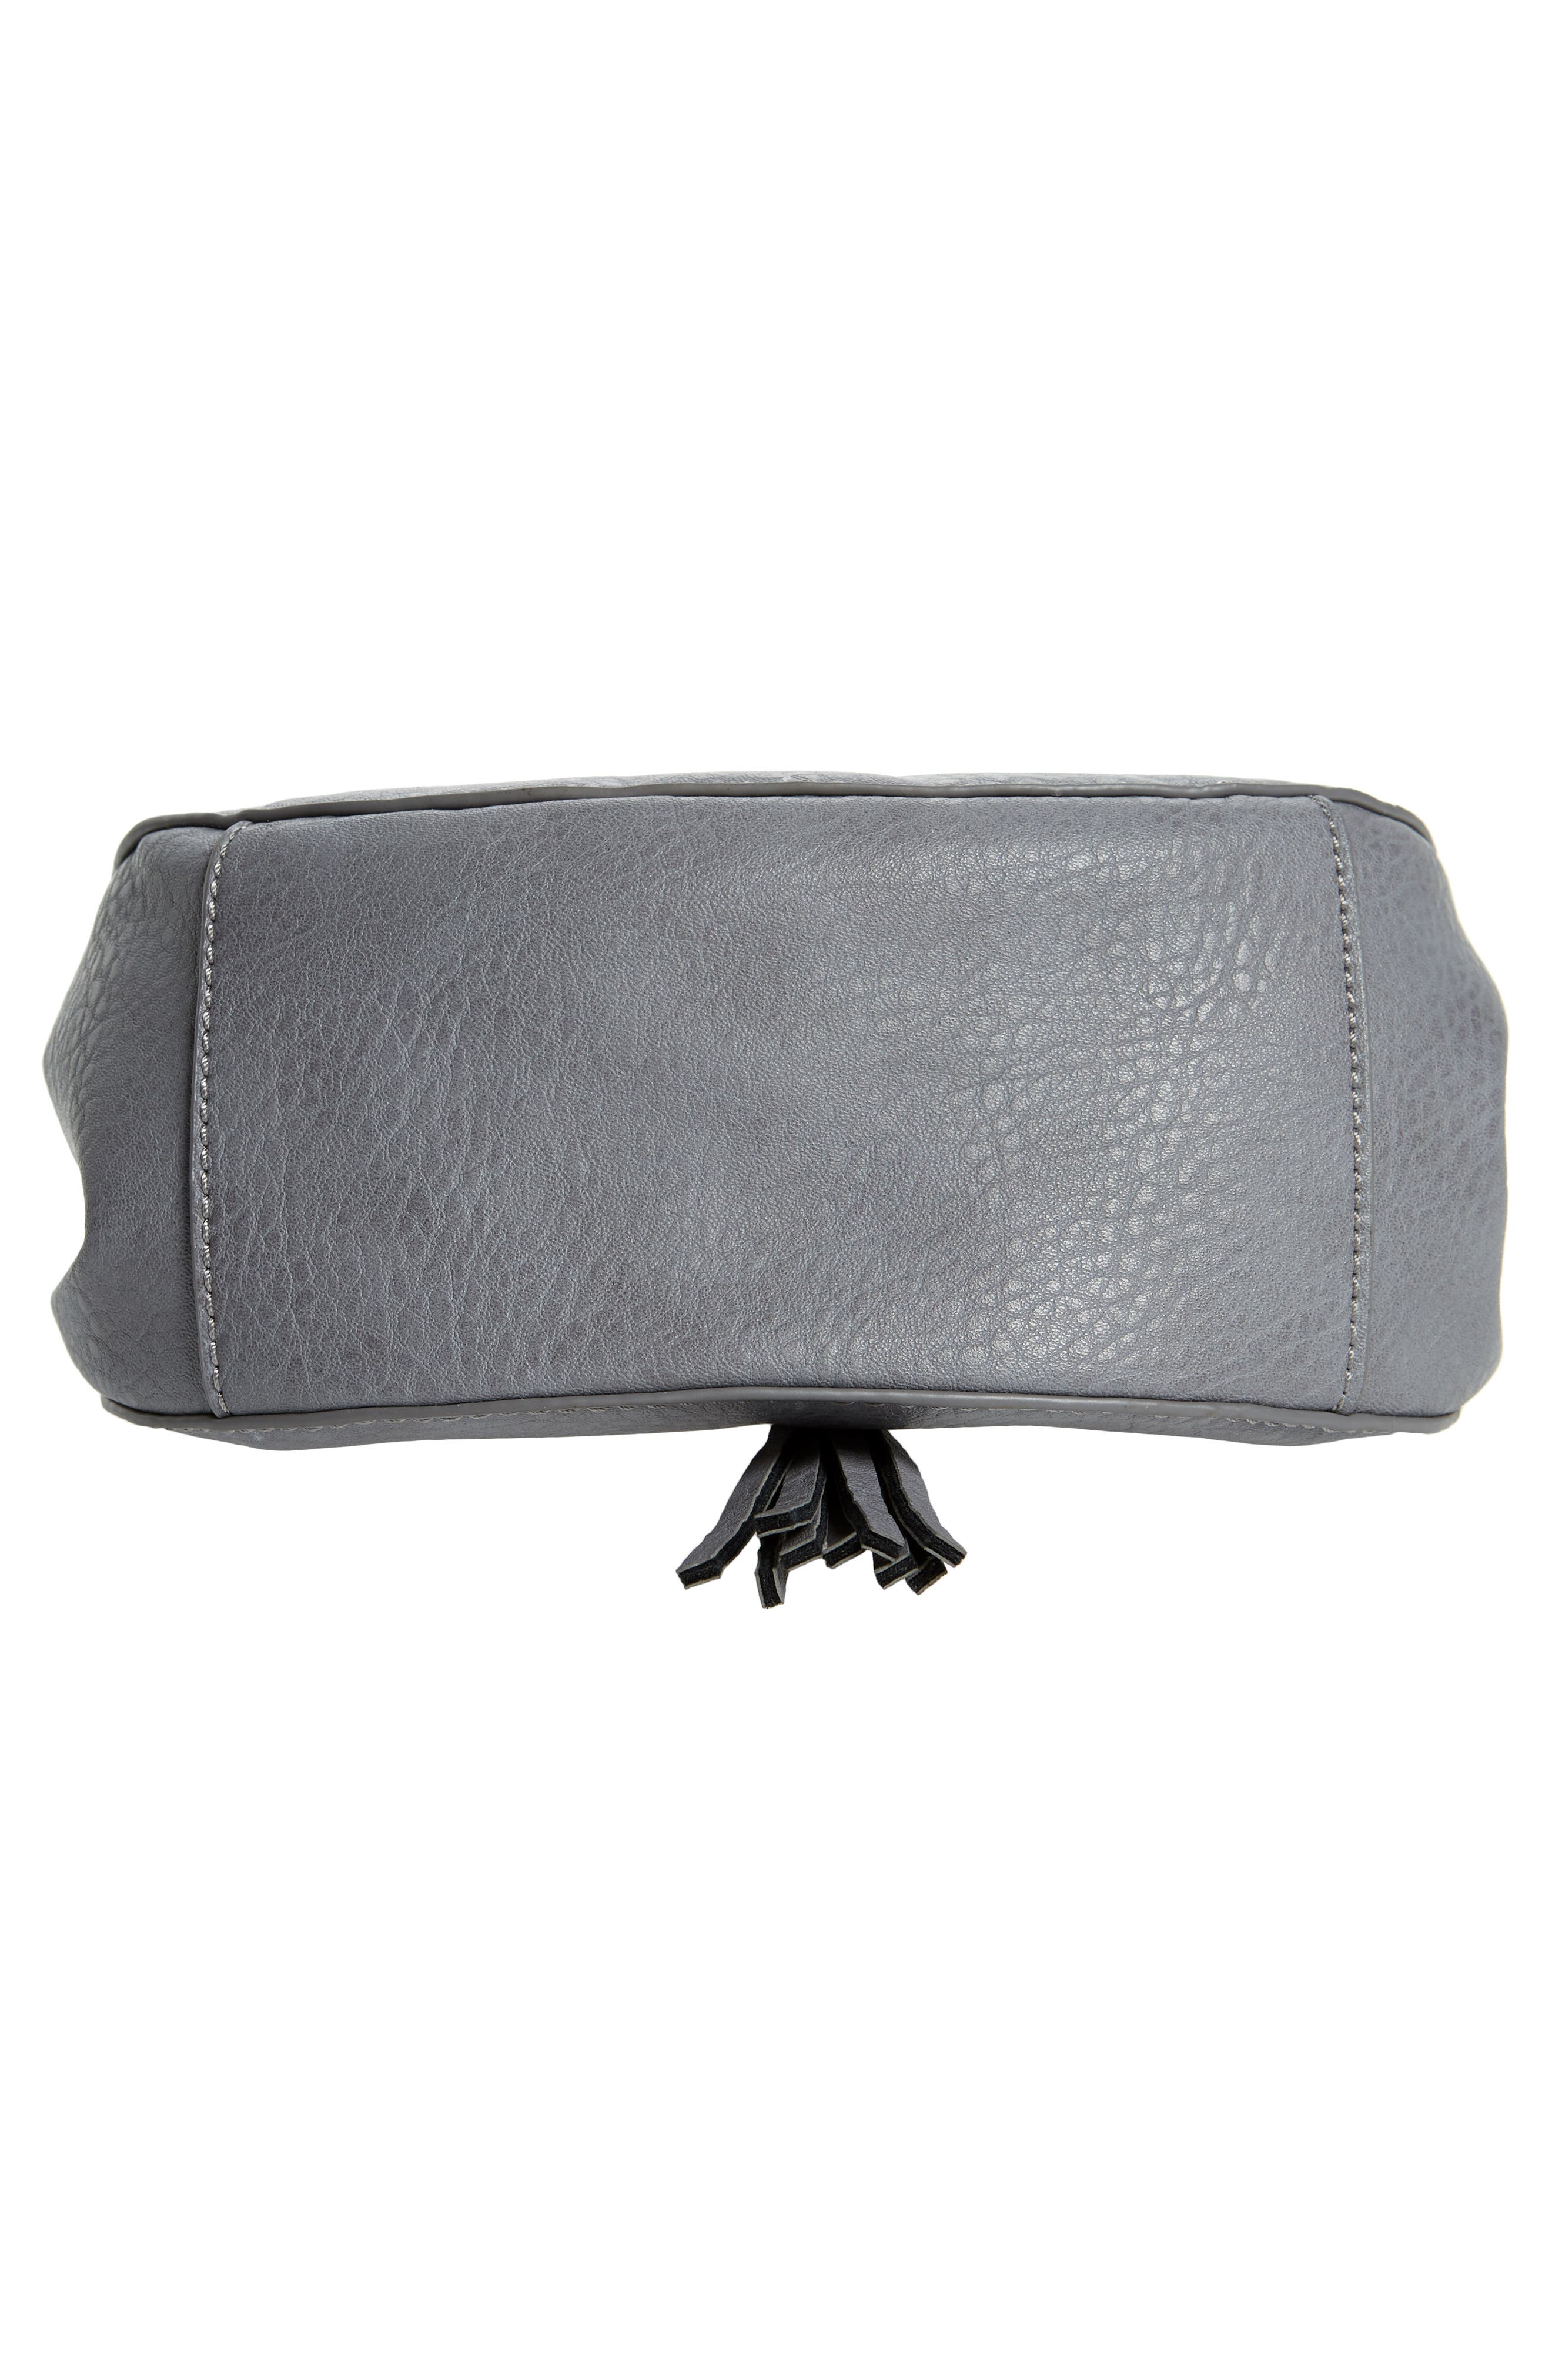 Tassel Faux Leather Crossbody Saddle Bag,                             Alternate thumbnail 11, color,